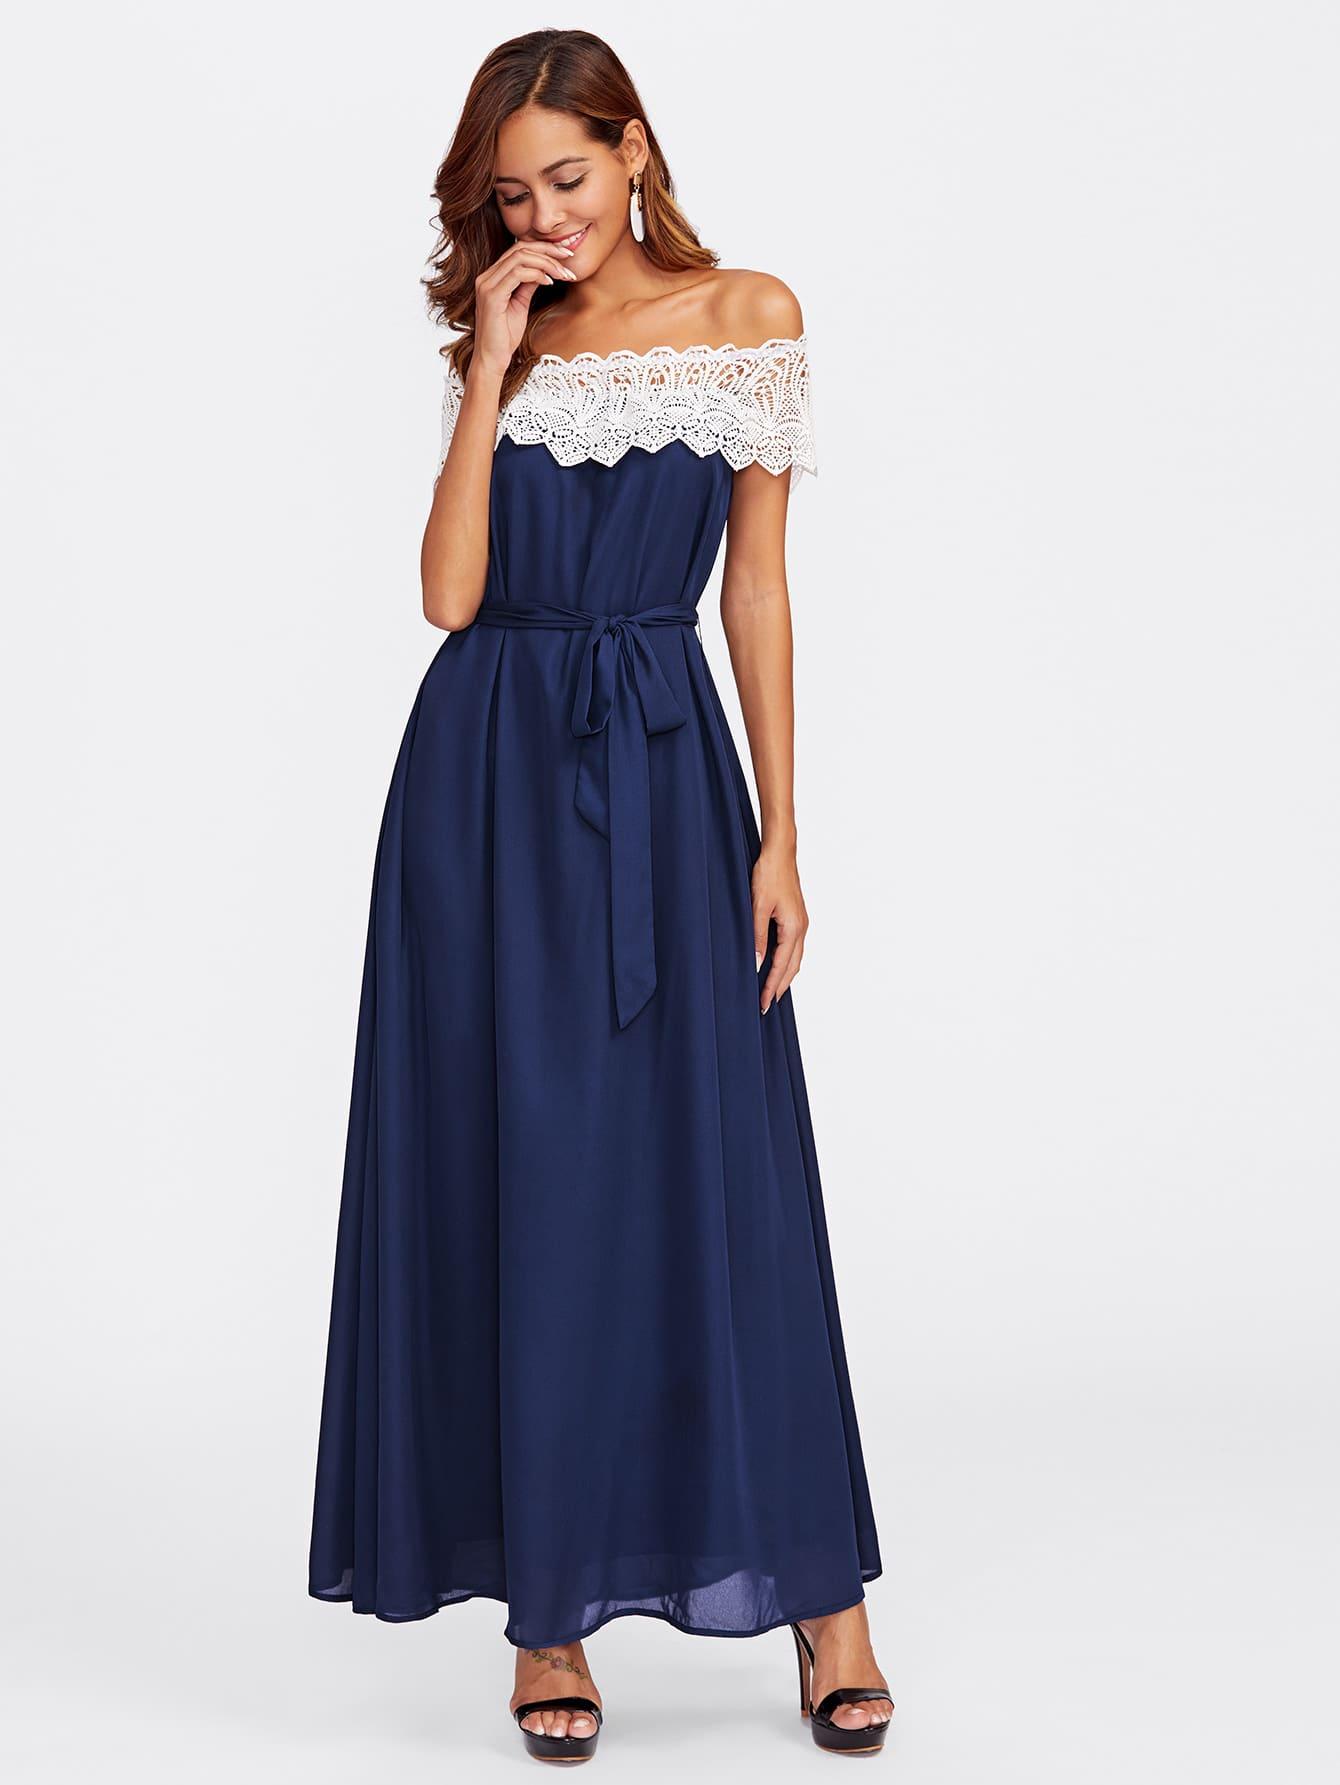 robe avec lacet avec col bateau dentelle bicolore french shein sheinside. Black Bedroom Furniture Sets. Home Design Ideas